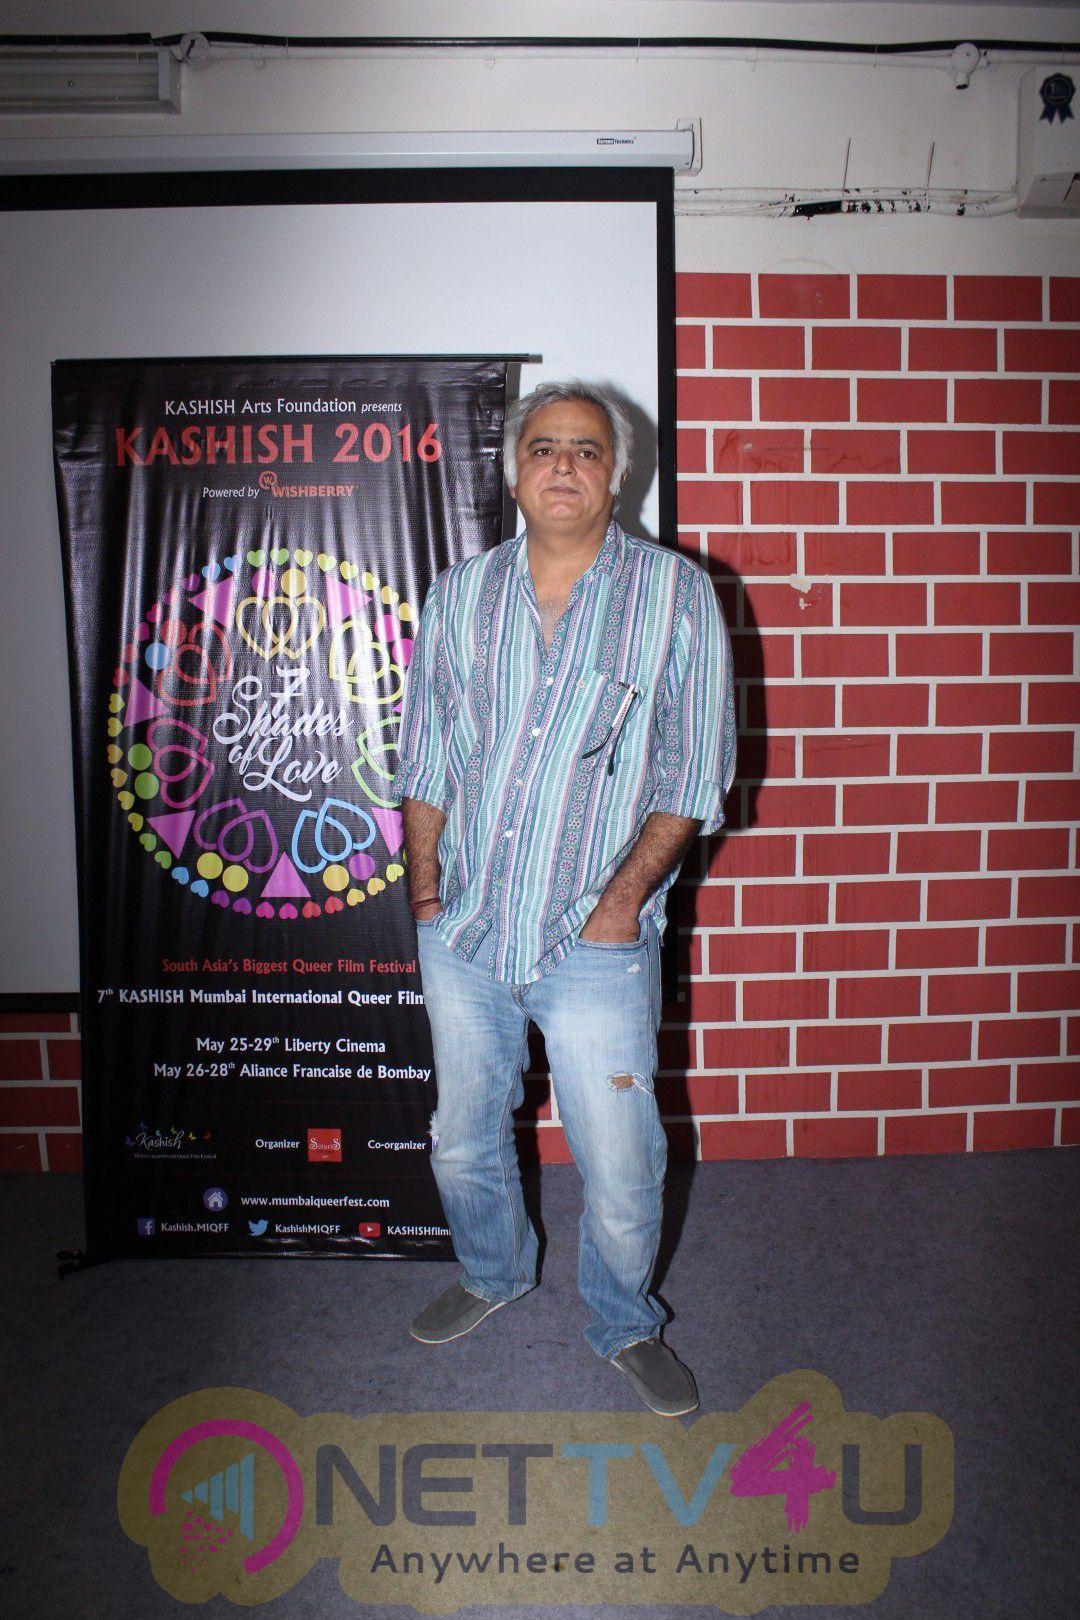 Kashish Film Festival 2016 With Hansal Mehta Attractive Photos